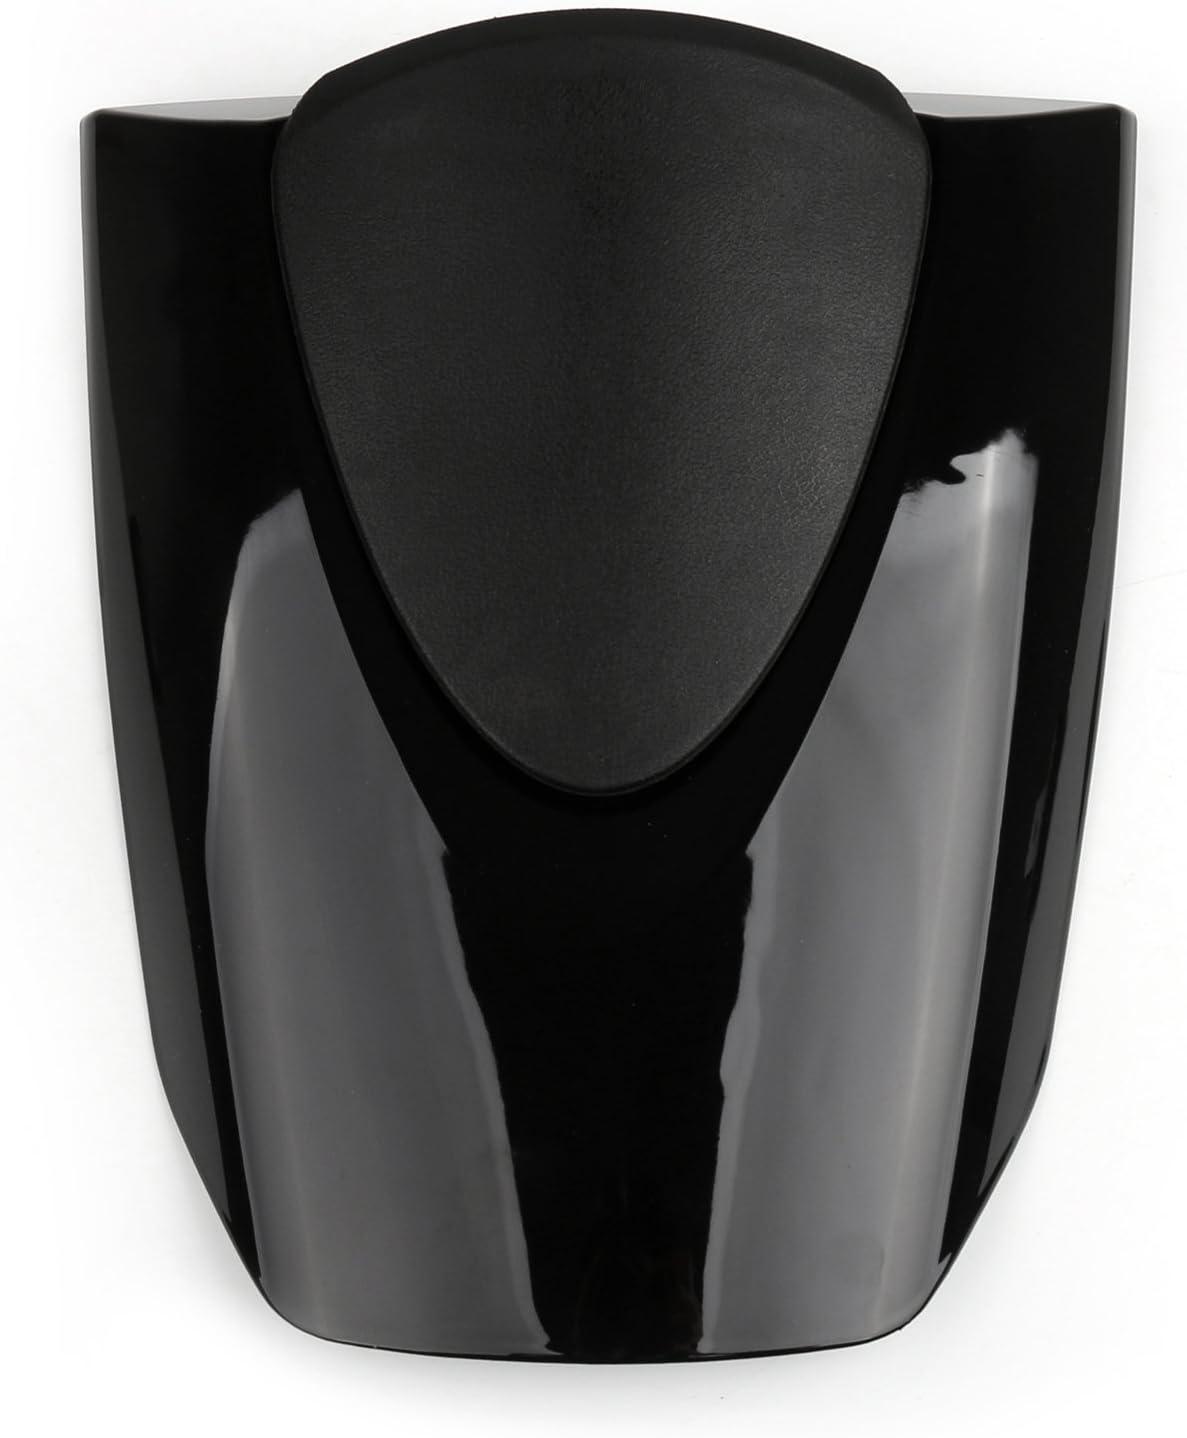 Artudatech Motorrad Soziusabdeckung Sitzkappe Verkleidung Heckabdeckung R/ücksitzbezug Rear Seat Cowl Fairing Tail Cover f/ür HON-DA CBR 600 RR CBR600RR 2007-2012